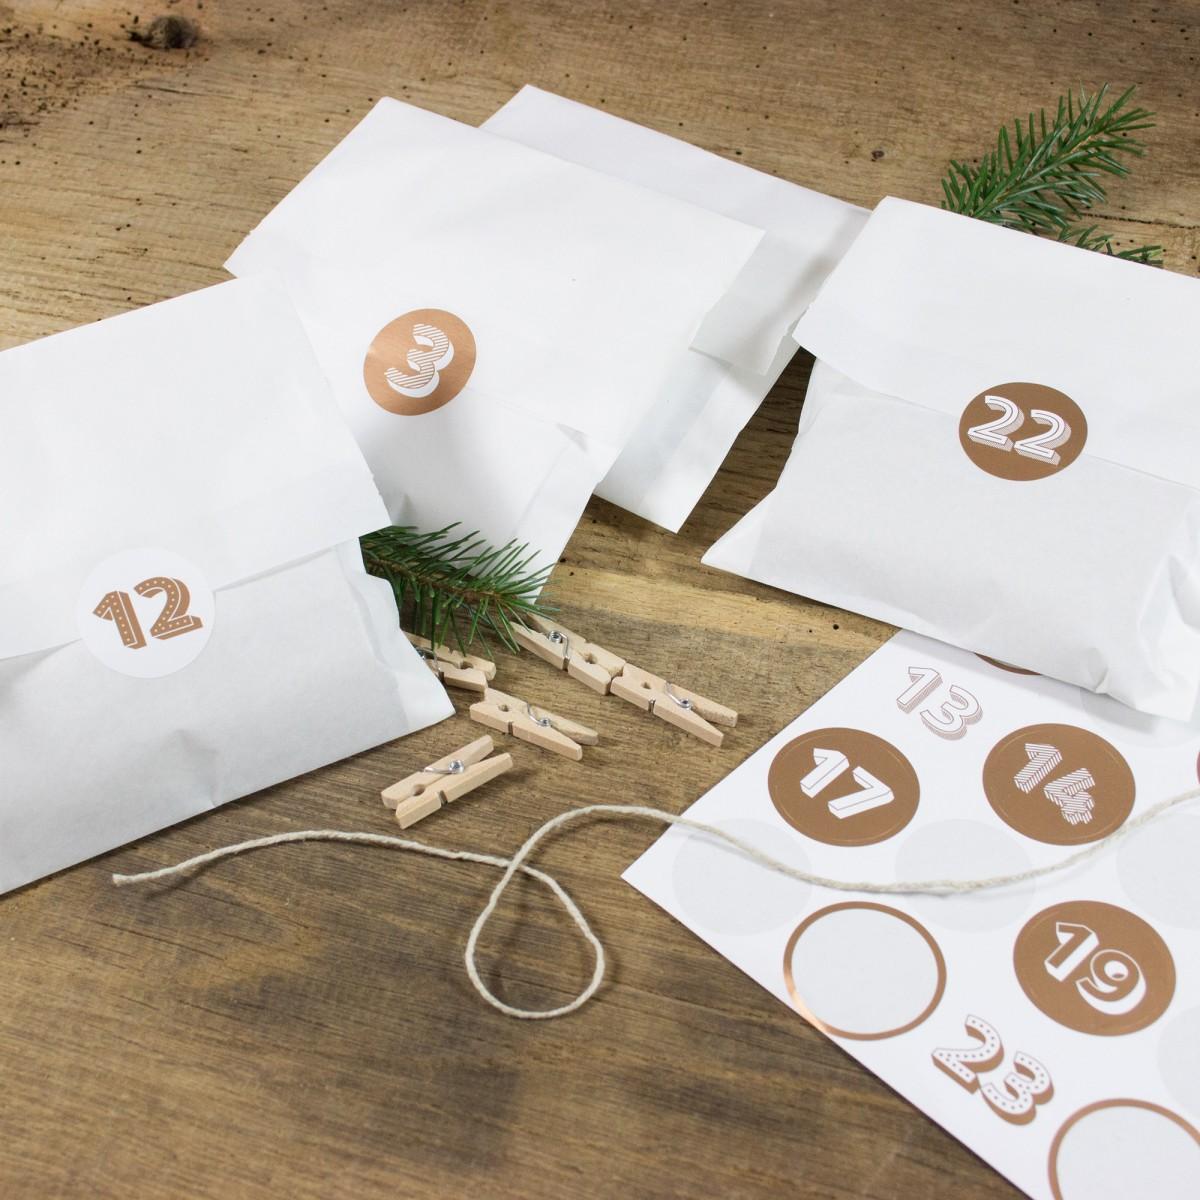 Bow & Hummingbird Adventskalender Weiß/Kupfer zum Befüllen